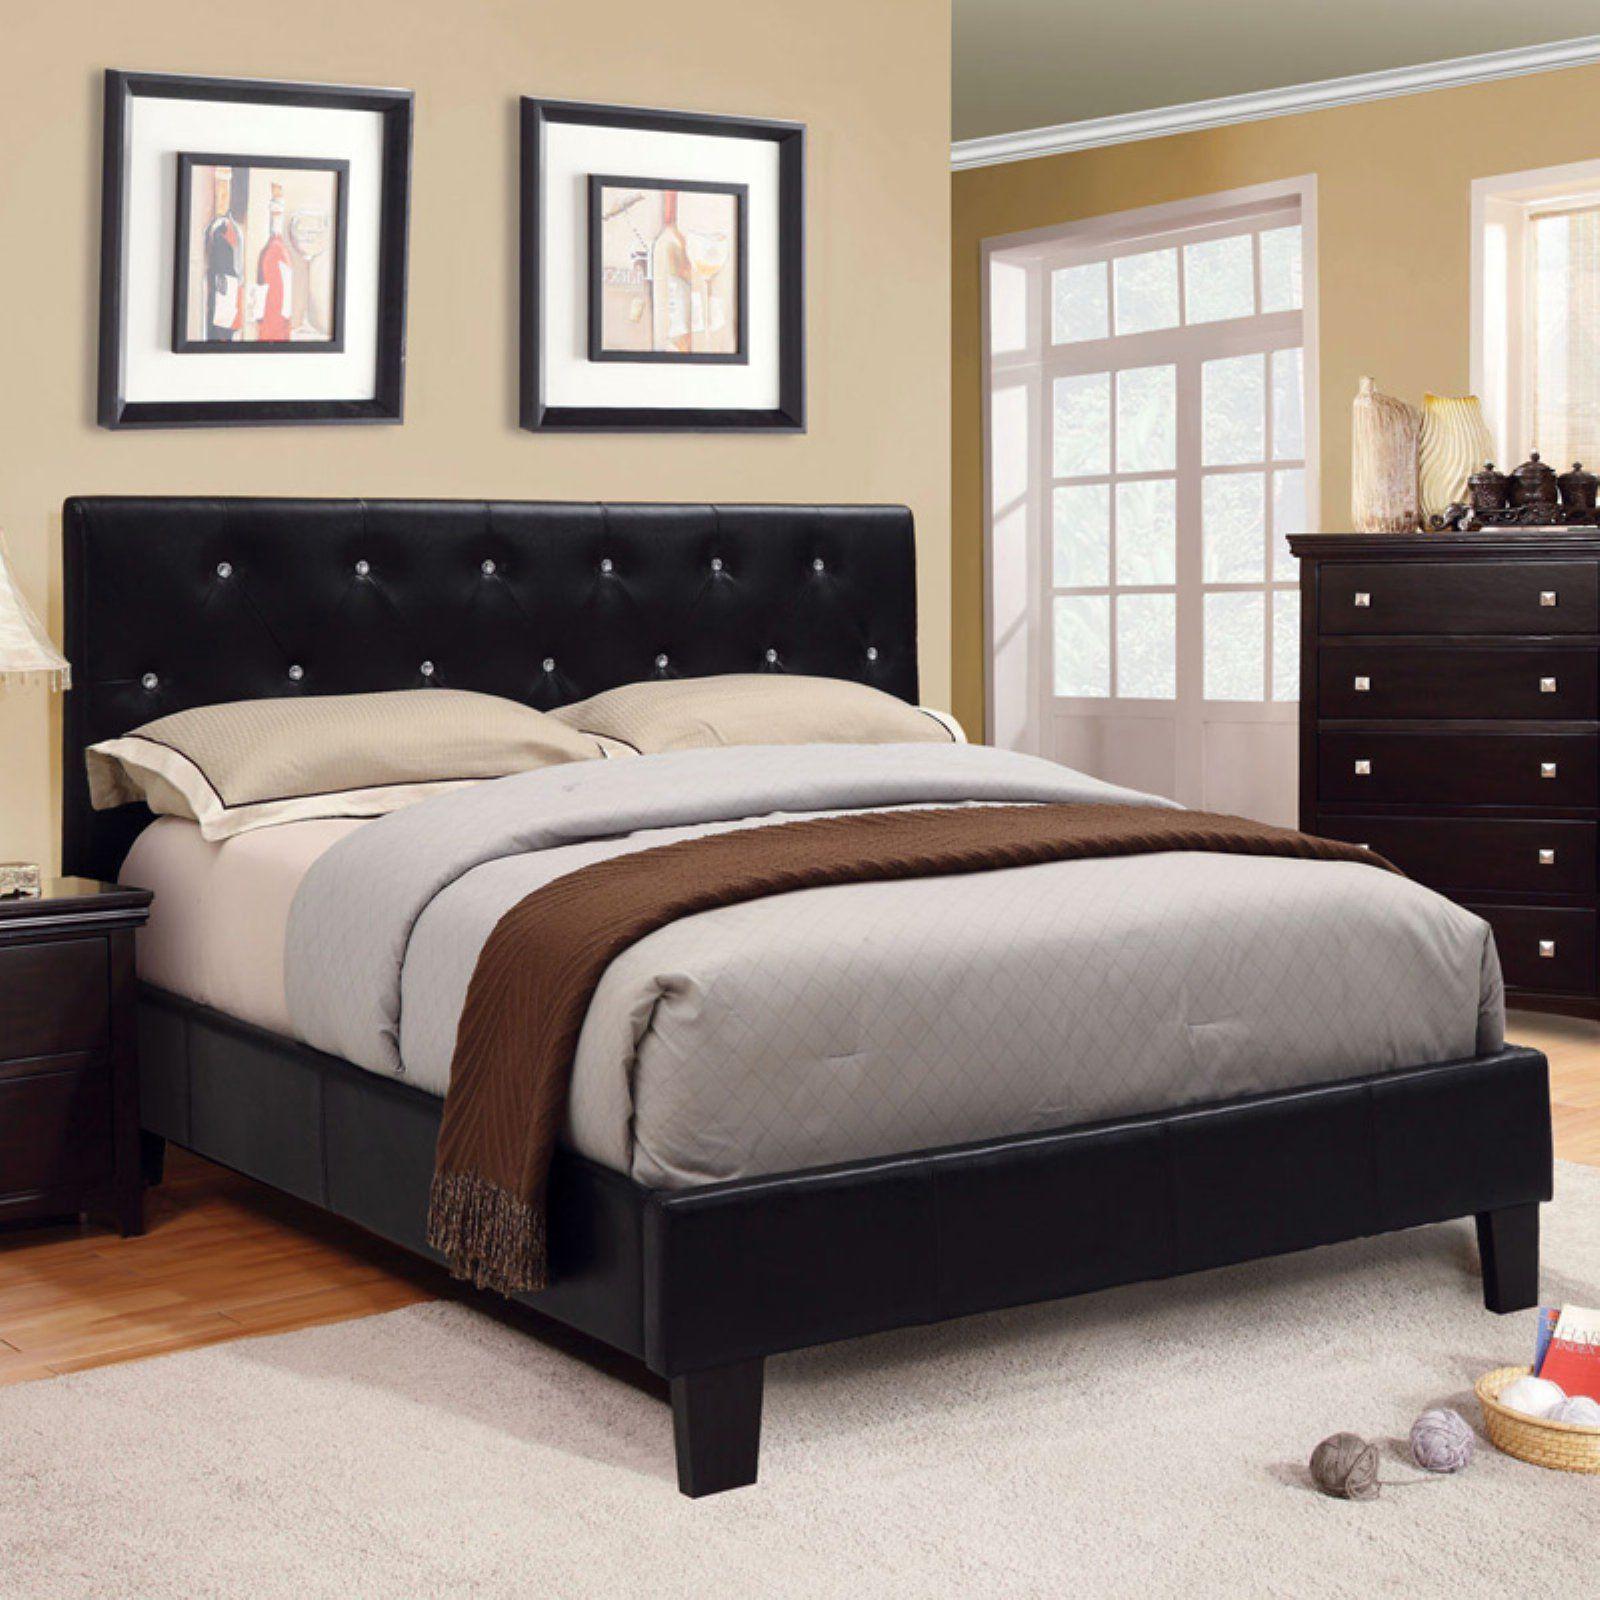 Furniture of America Vanna Rhinestone Tufted Platform Bed ...